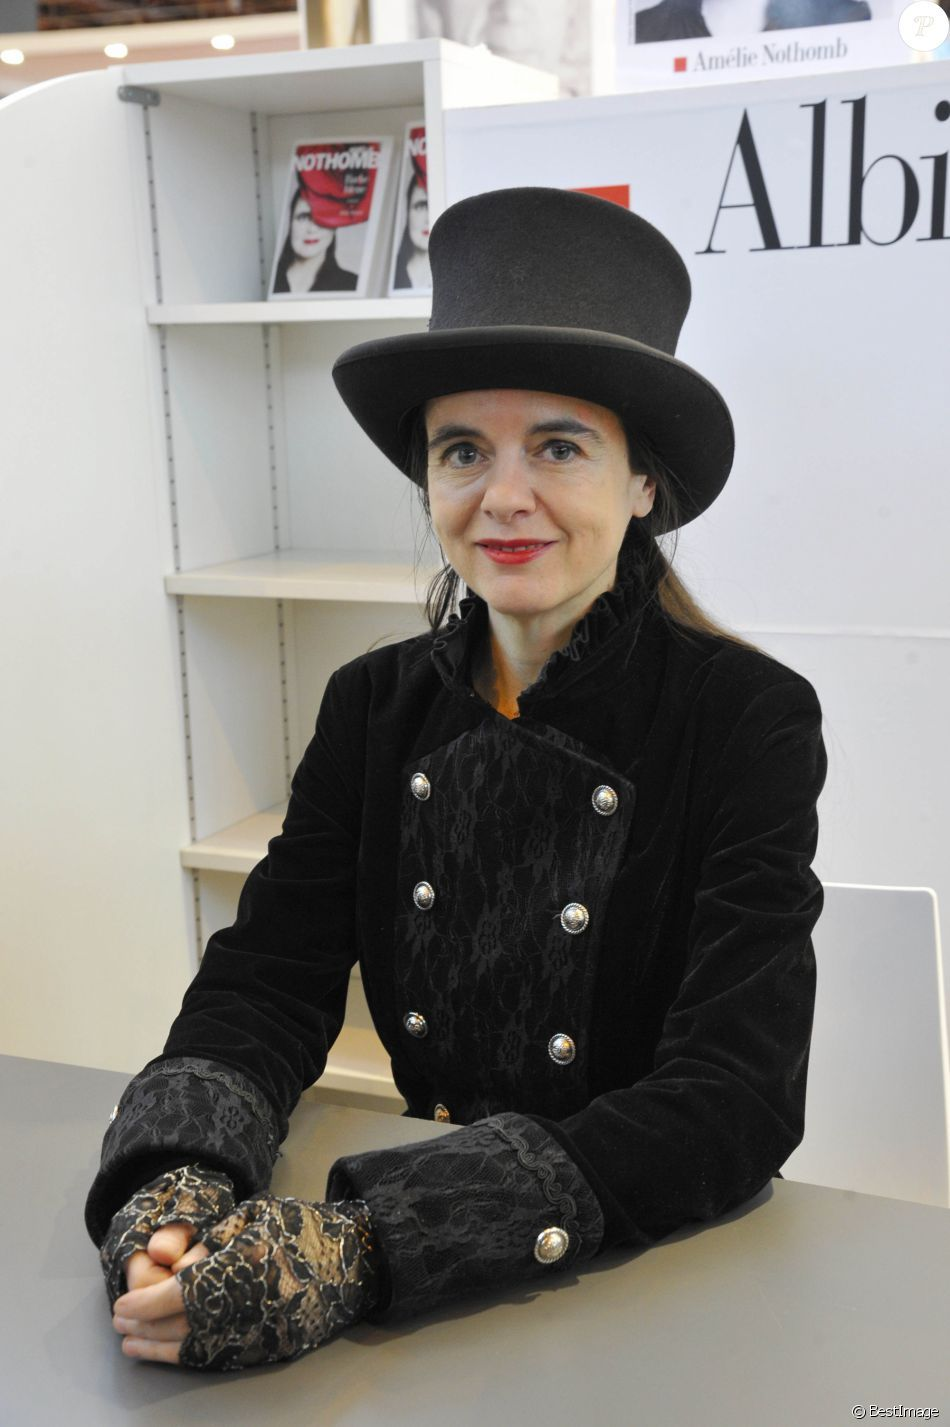 Amelie Nothomb techbizdesign hall of fame